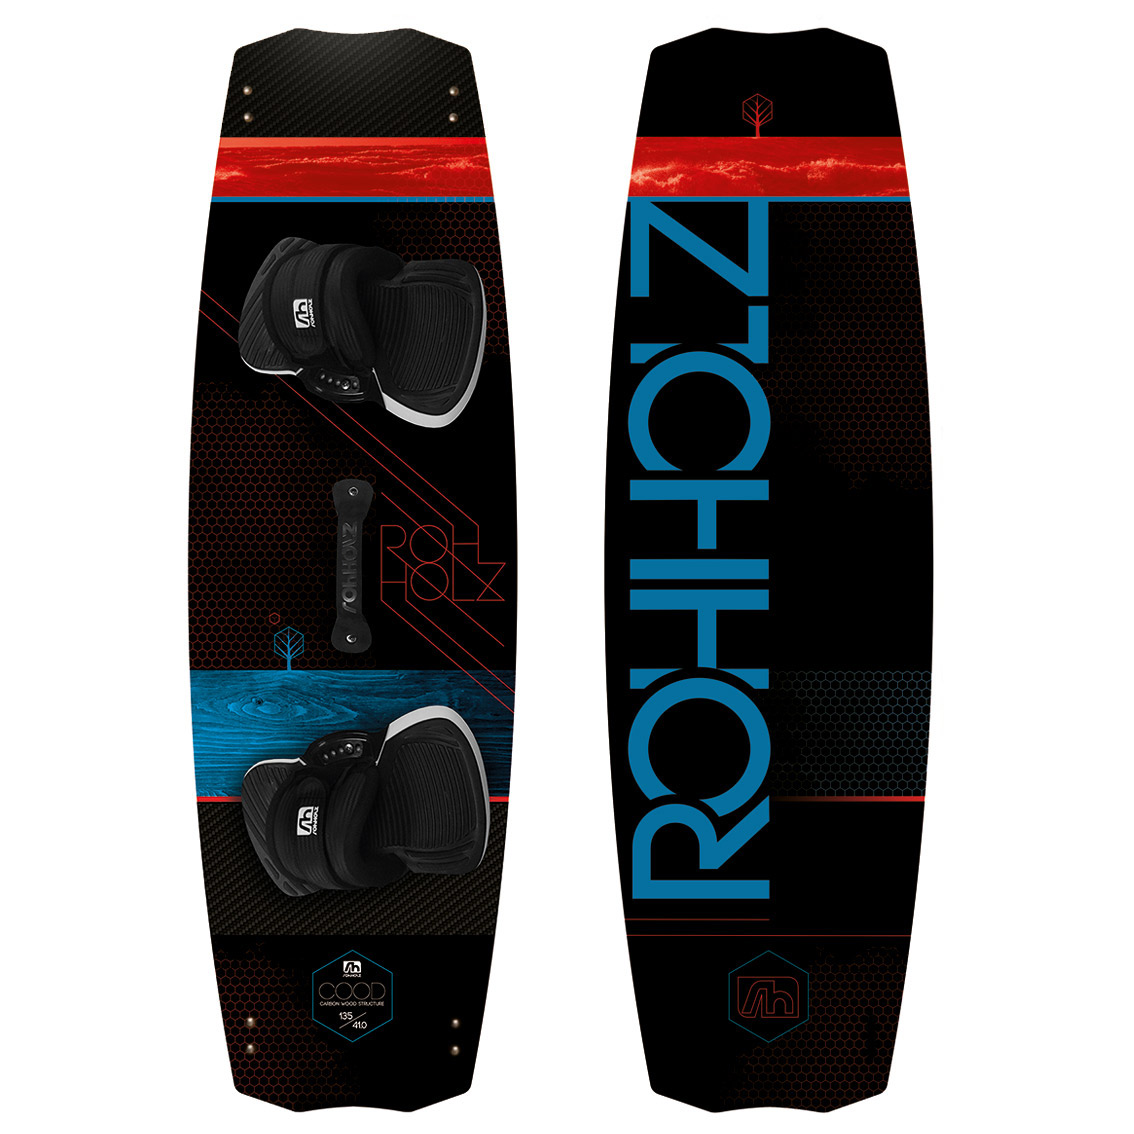 Rohholz Cood2 Kiteboard